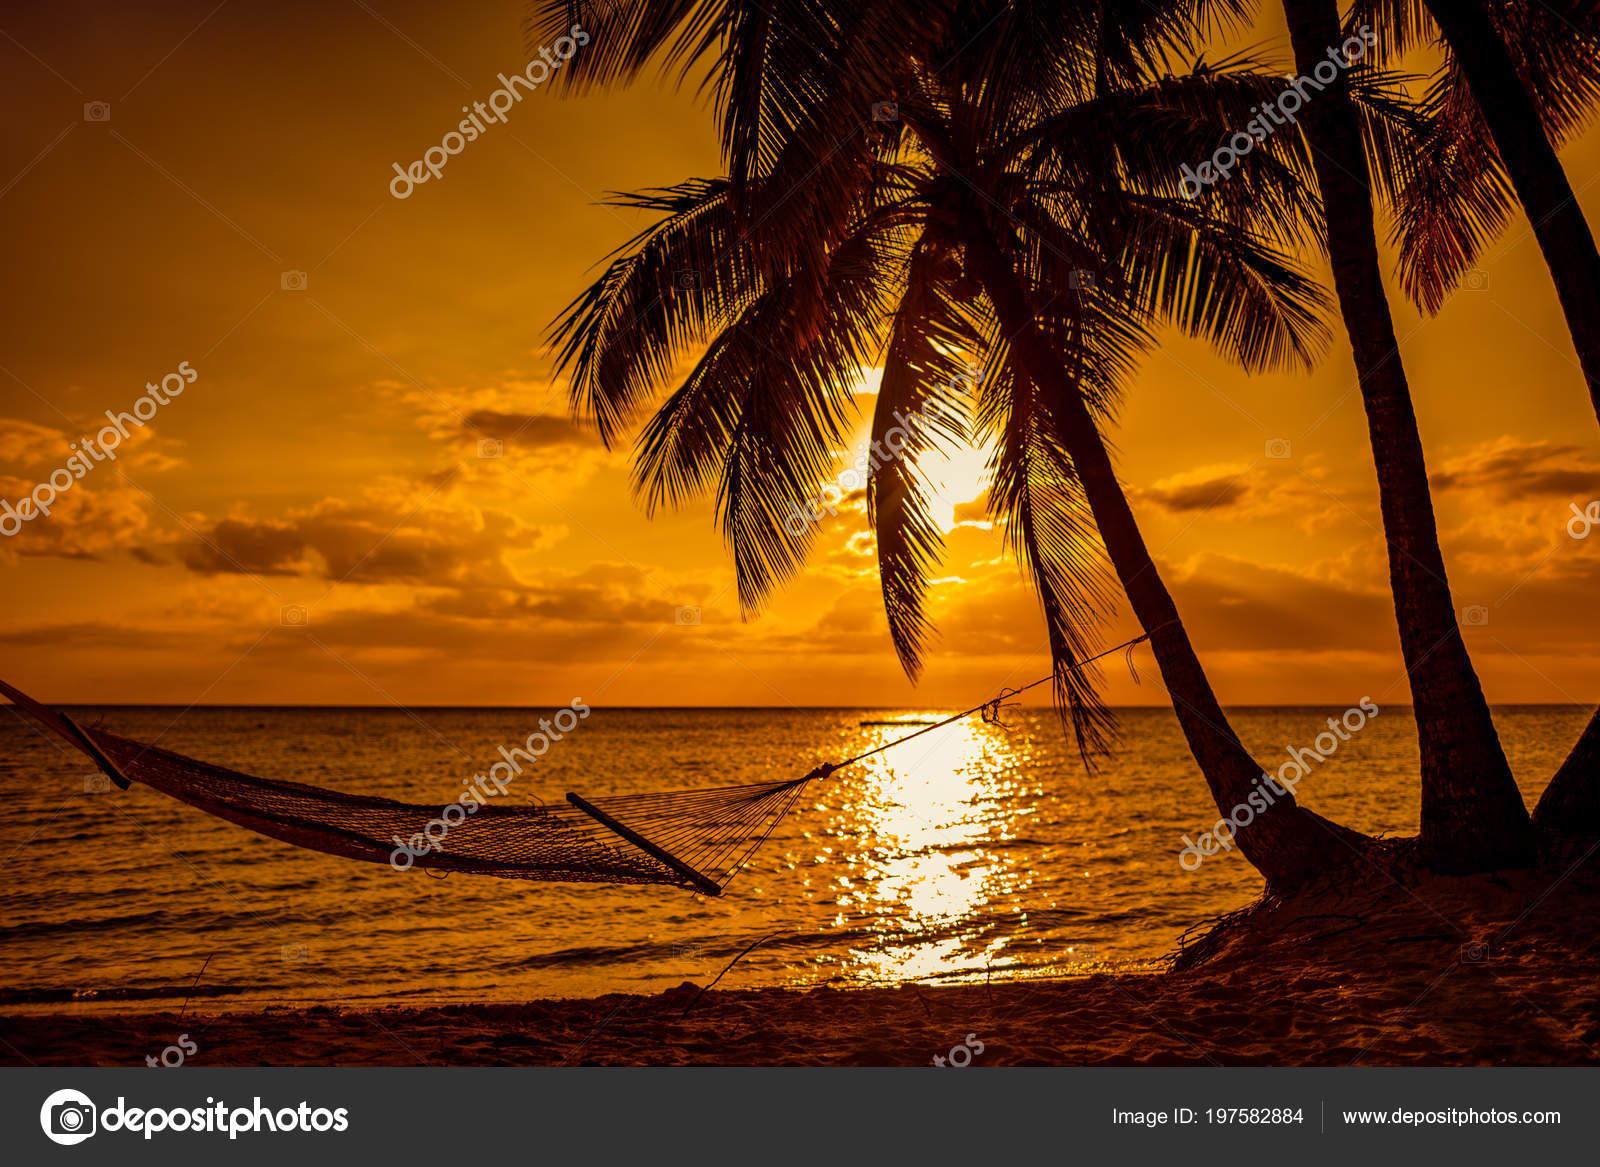 Silhouette Hammock Palm Trees Tropical Beach Sunset Fiji